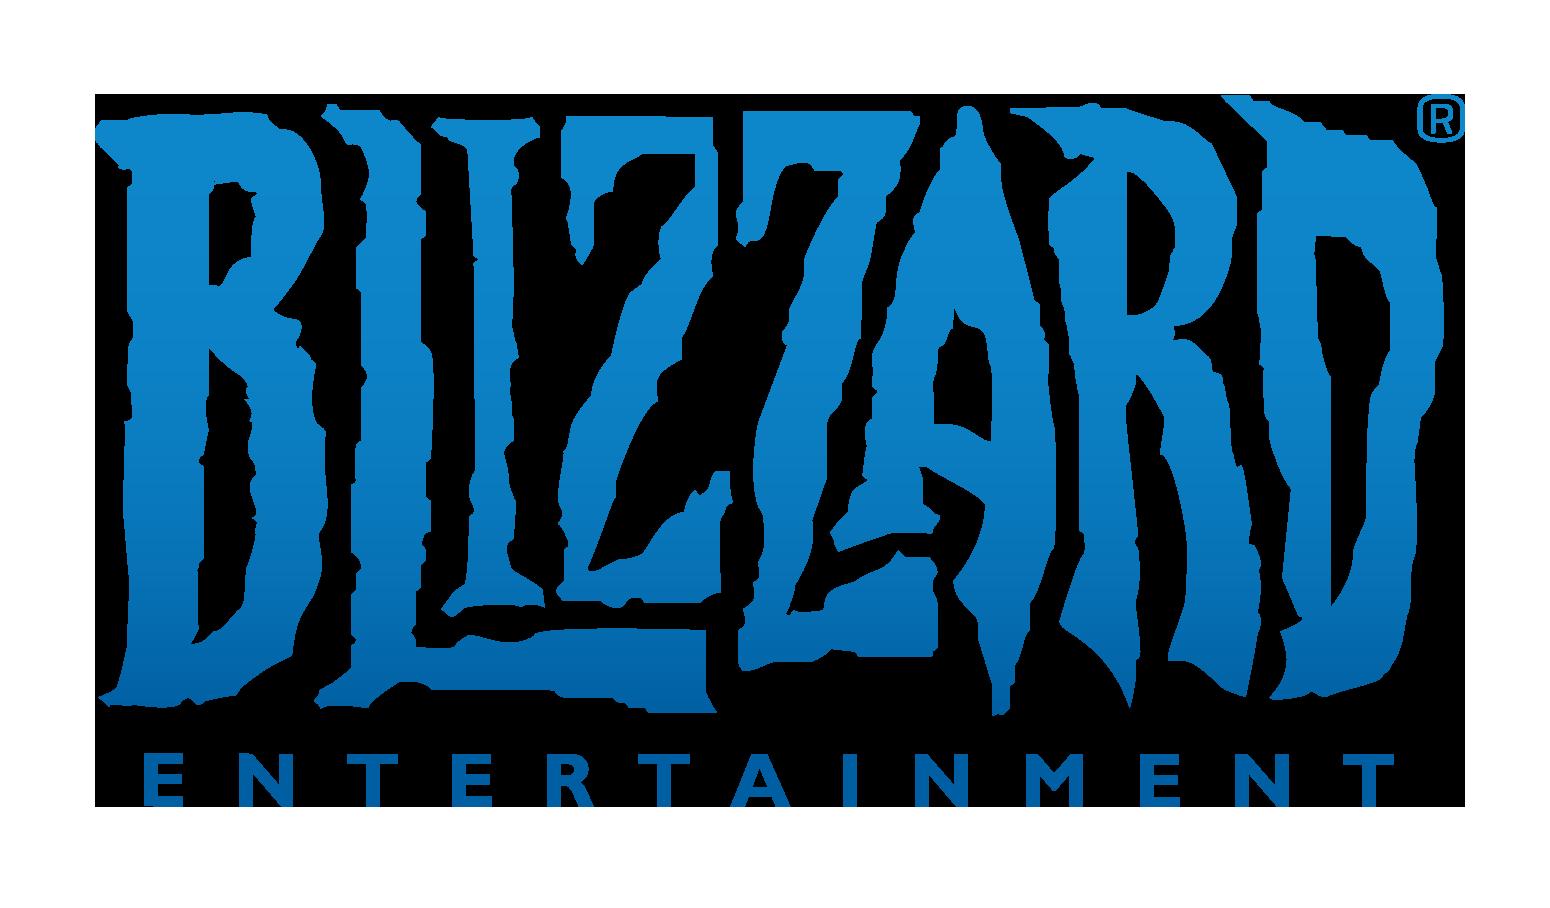 Blizzard Entertainment's online newsroom